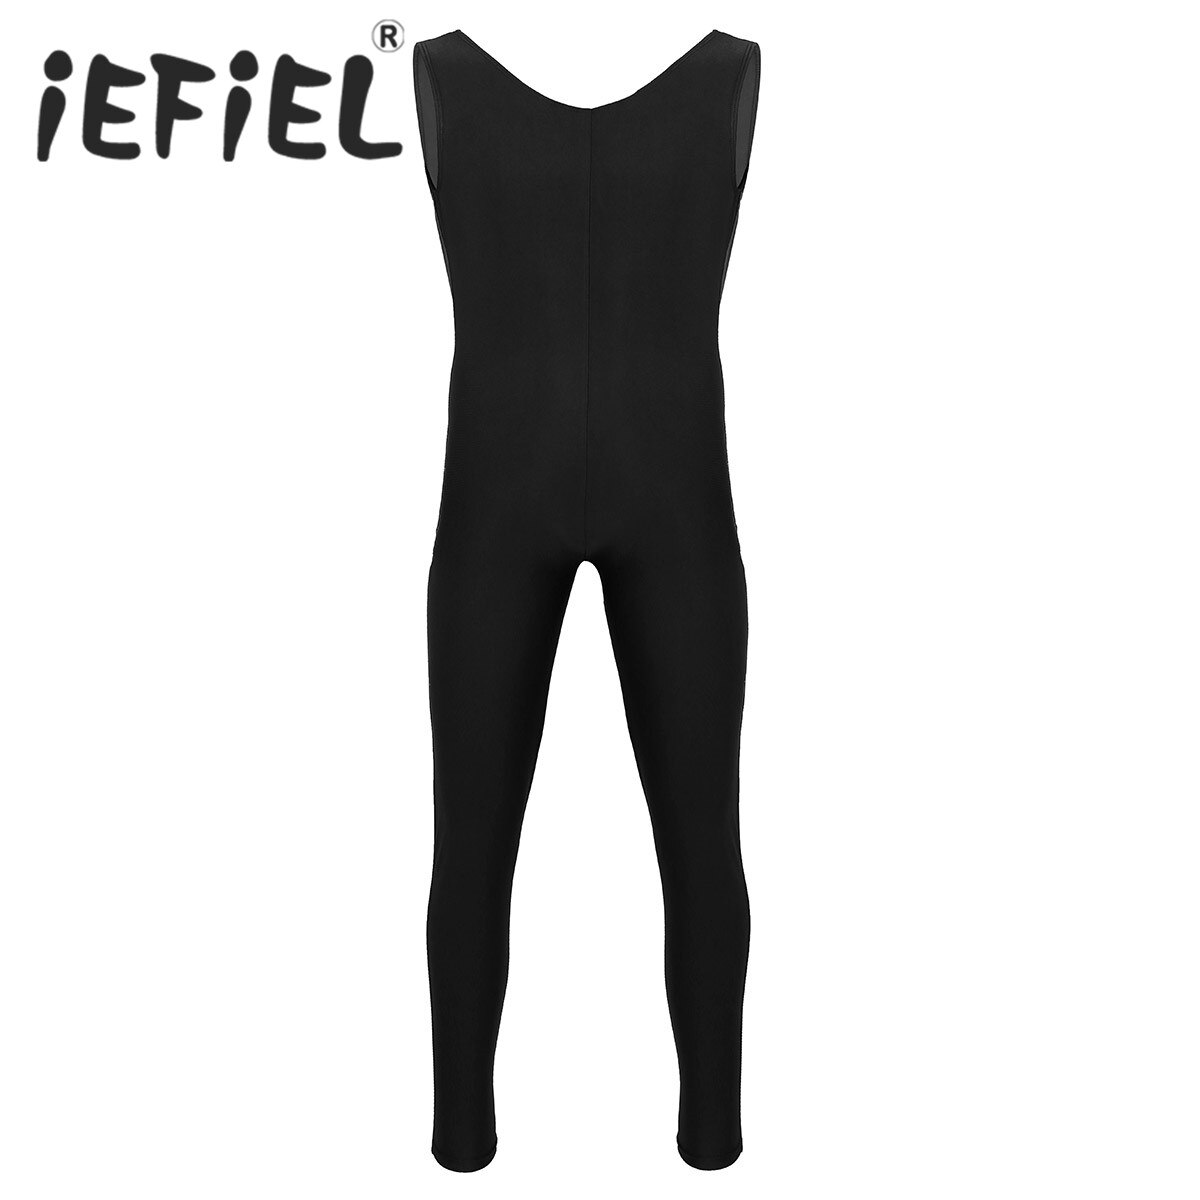 Male Mens Adults Dance Bodysuit Well Fit One Piece Scoop Neck Sleeveless Skin-Tight Solid Color Vest Unitard Bodysuit Dancewear